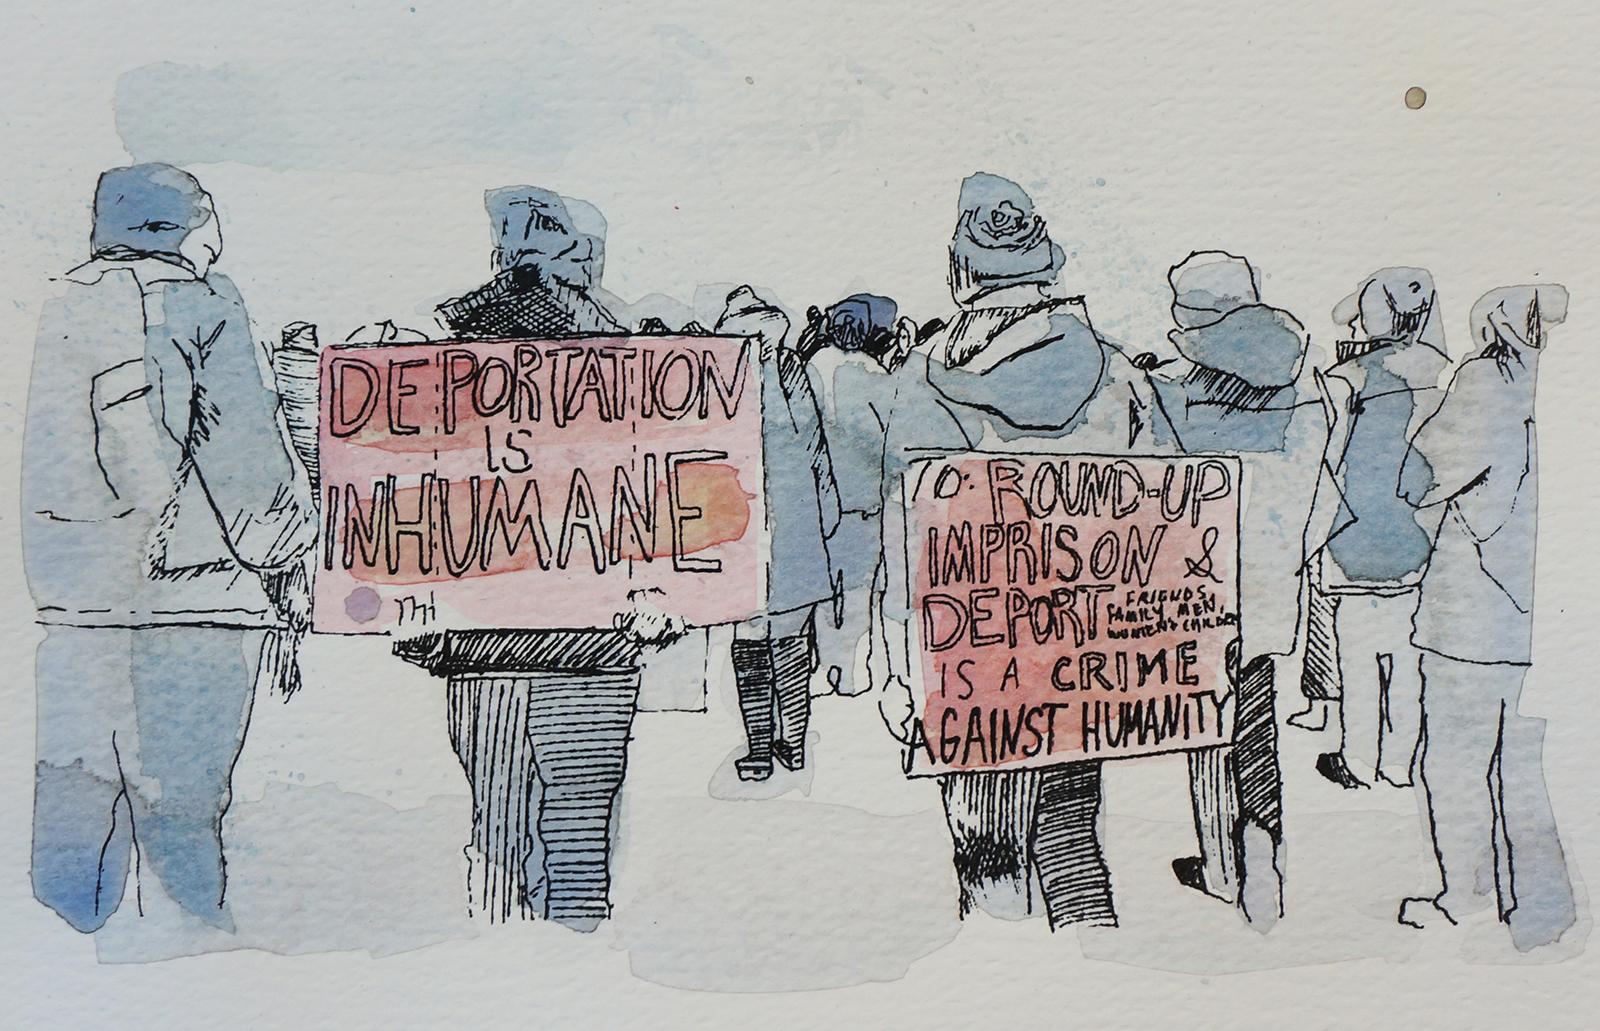 Ape_Bleakney_March Mixed Media - 'Inhumane (4)', 6.5''x9.5'', Screen Print + Watercolor, 2018 copy.jpg